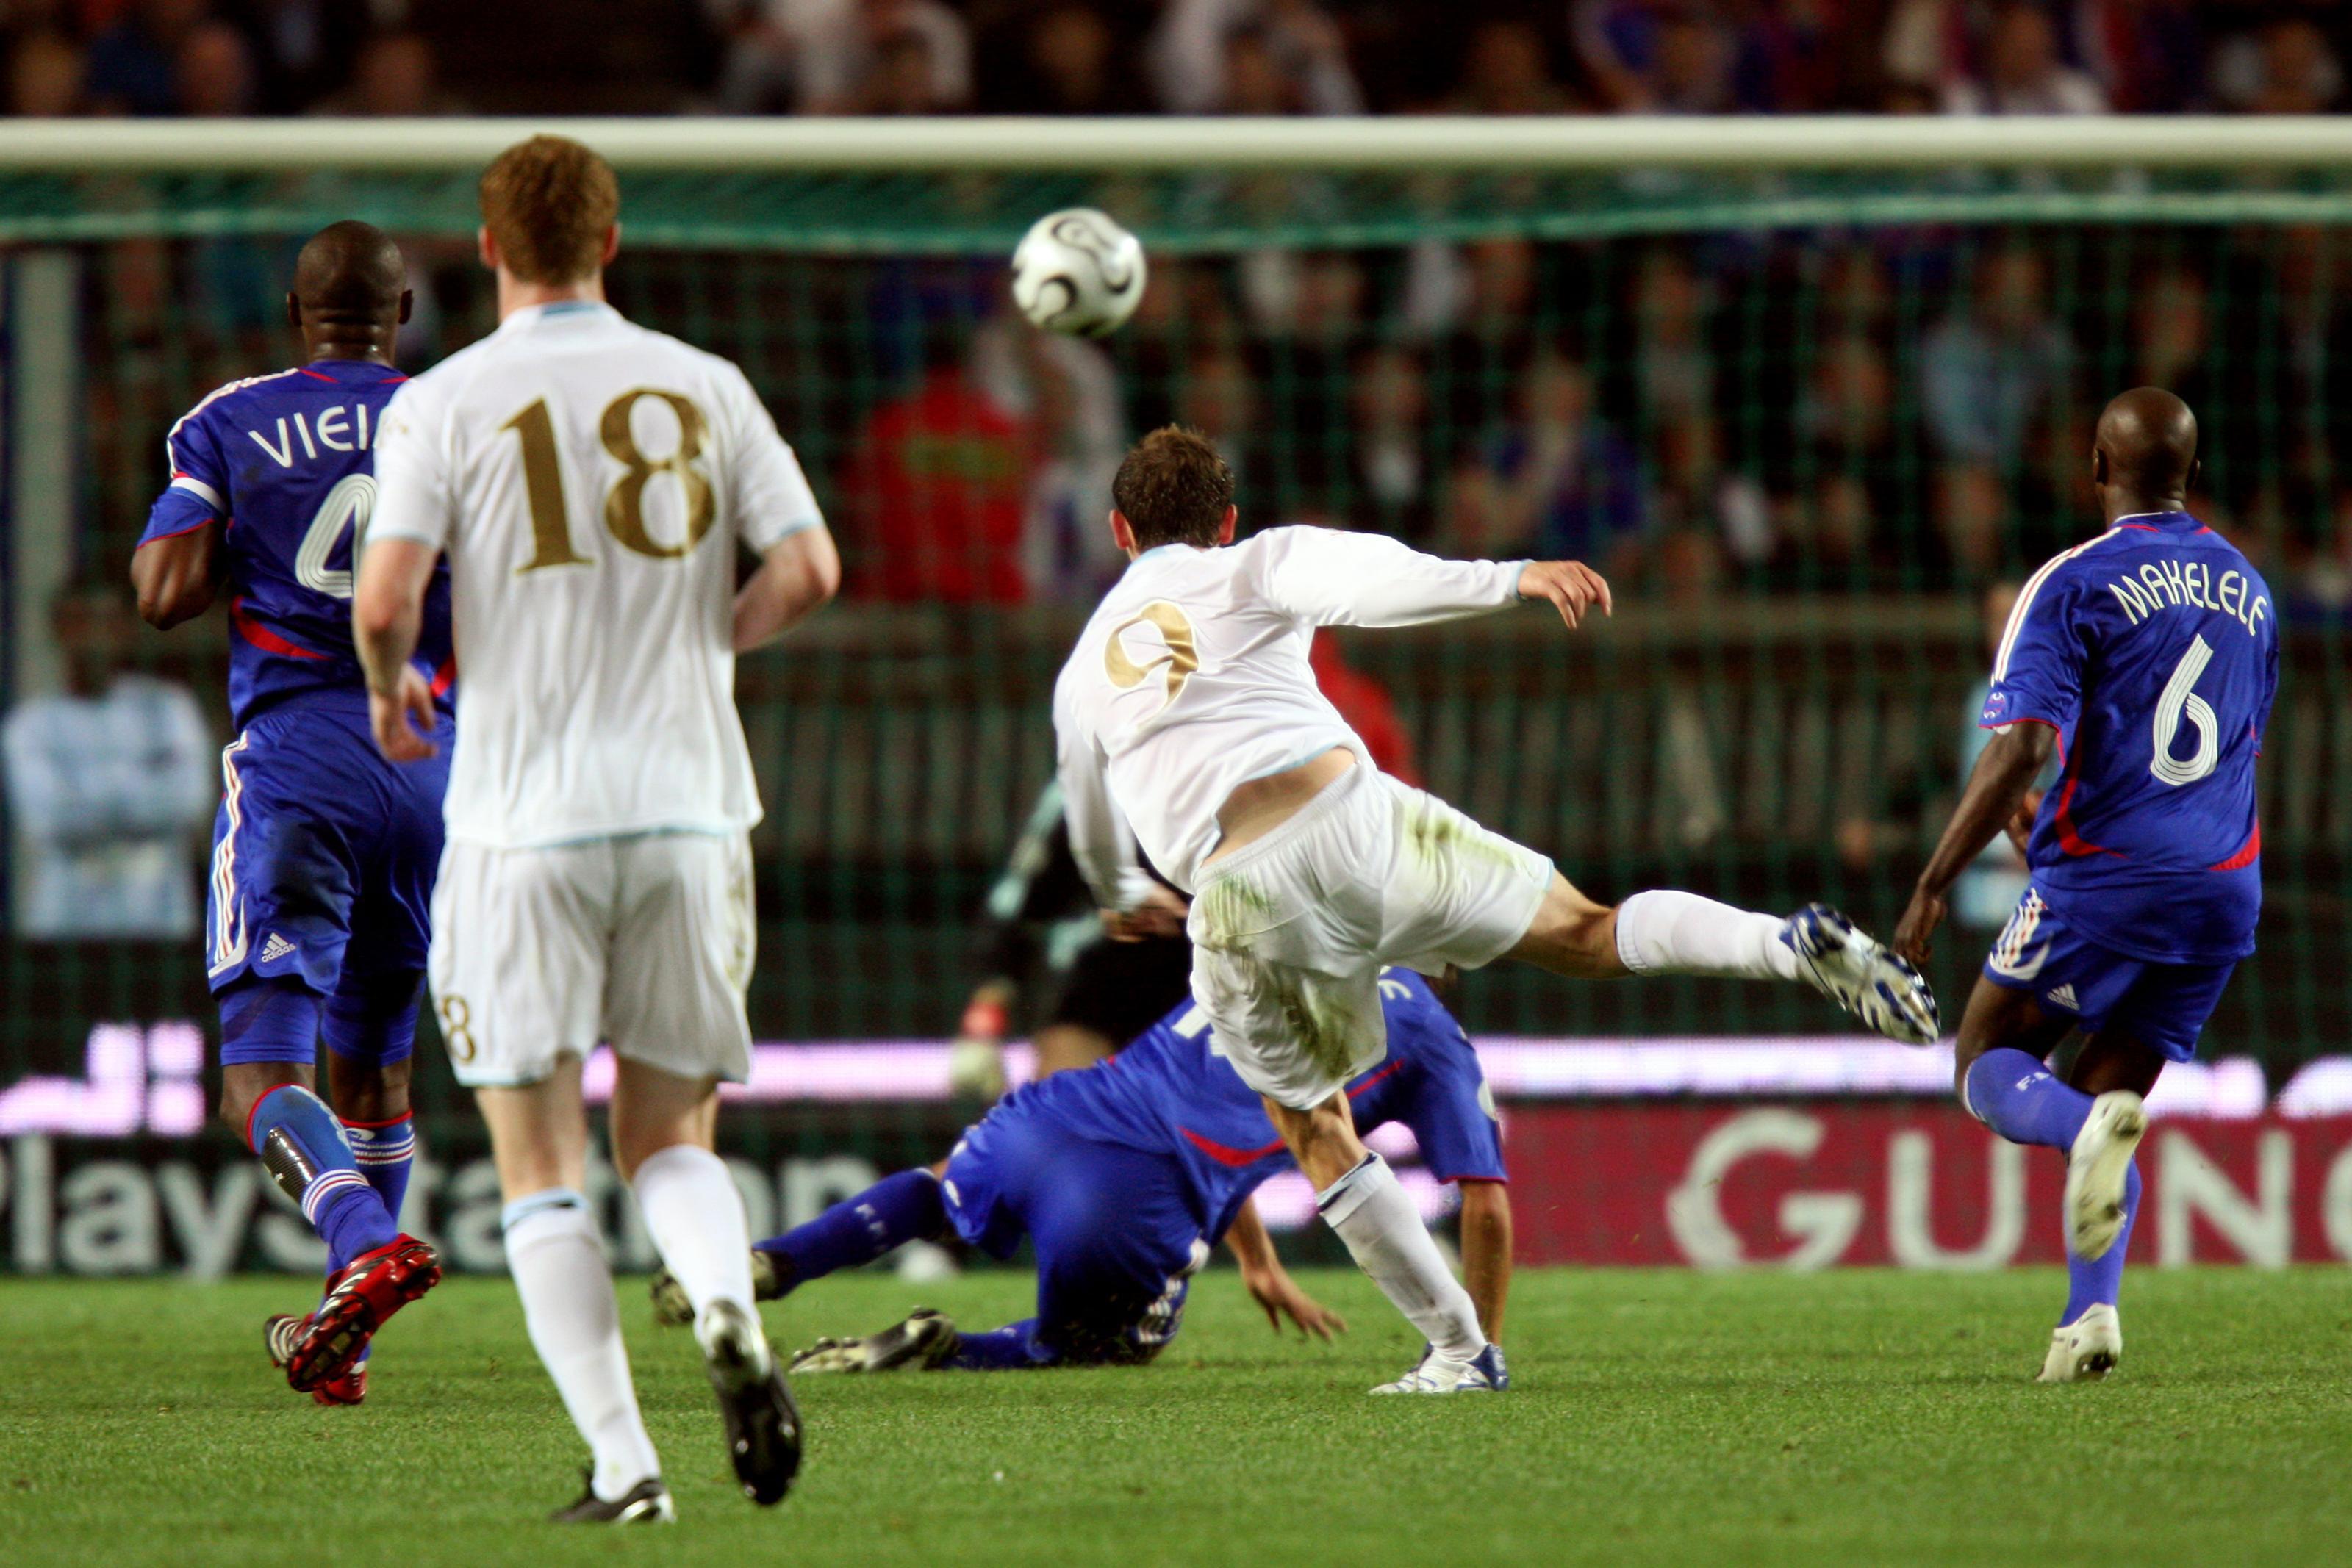 Scotland's James Mcfadden scores against France (David Davies/PA)